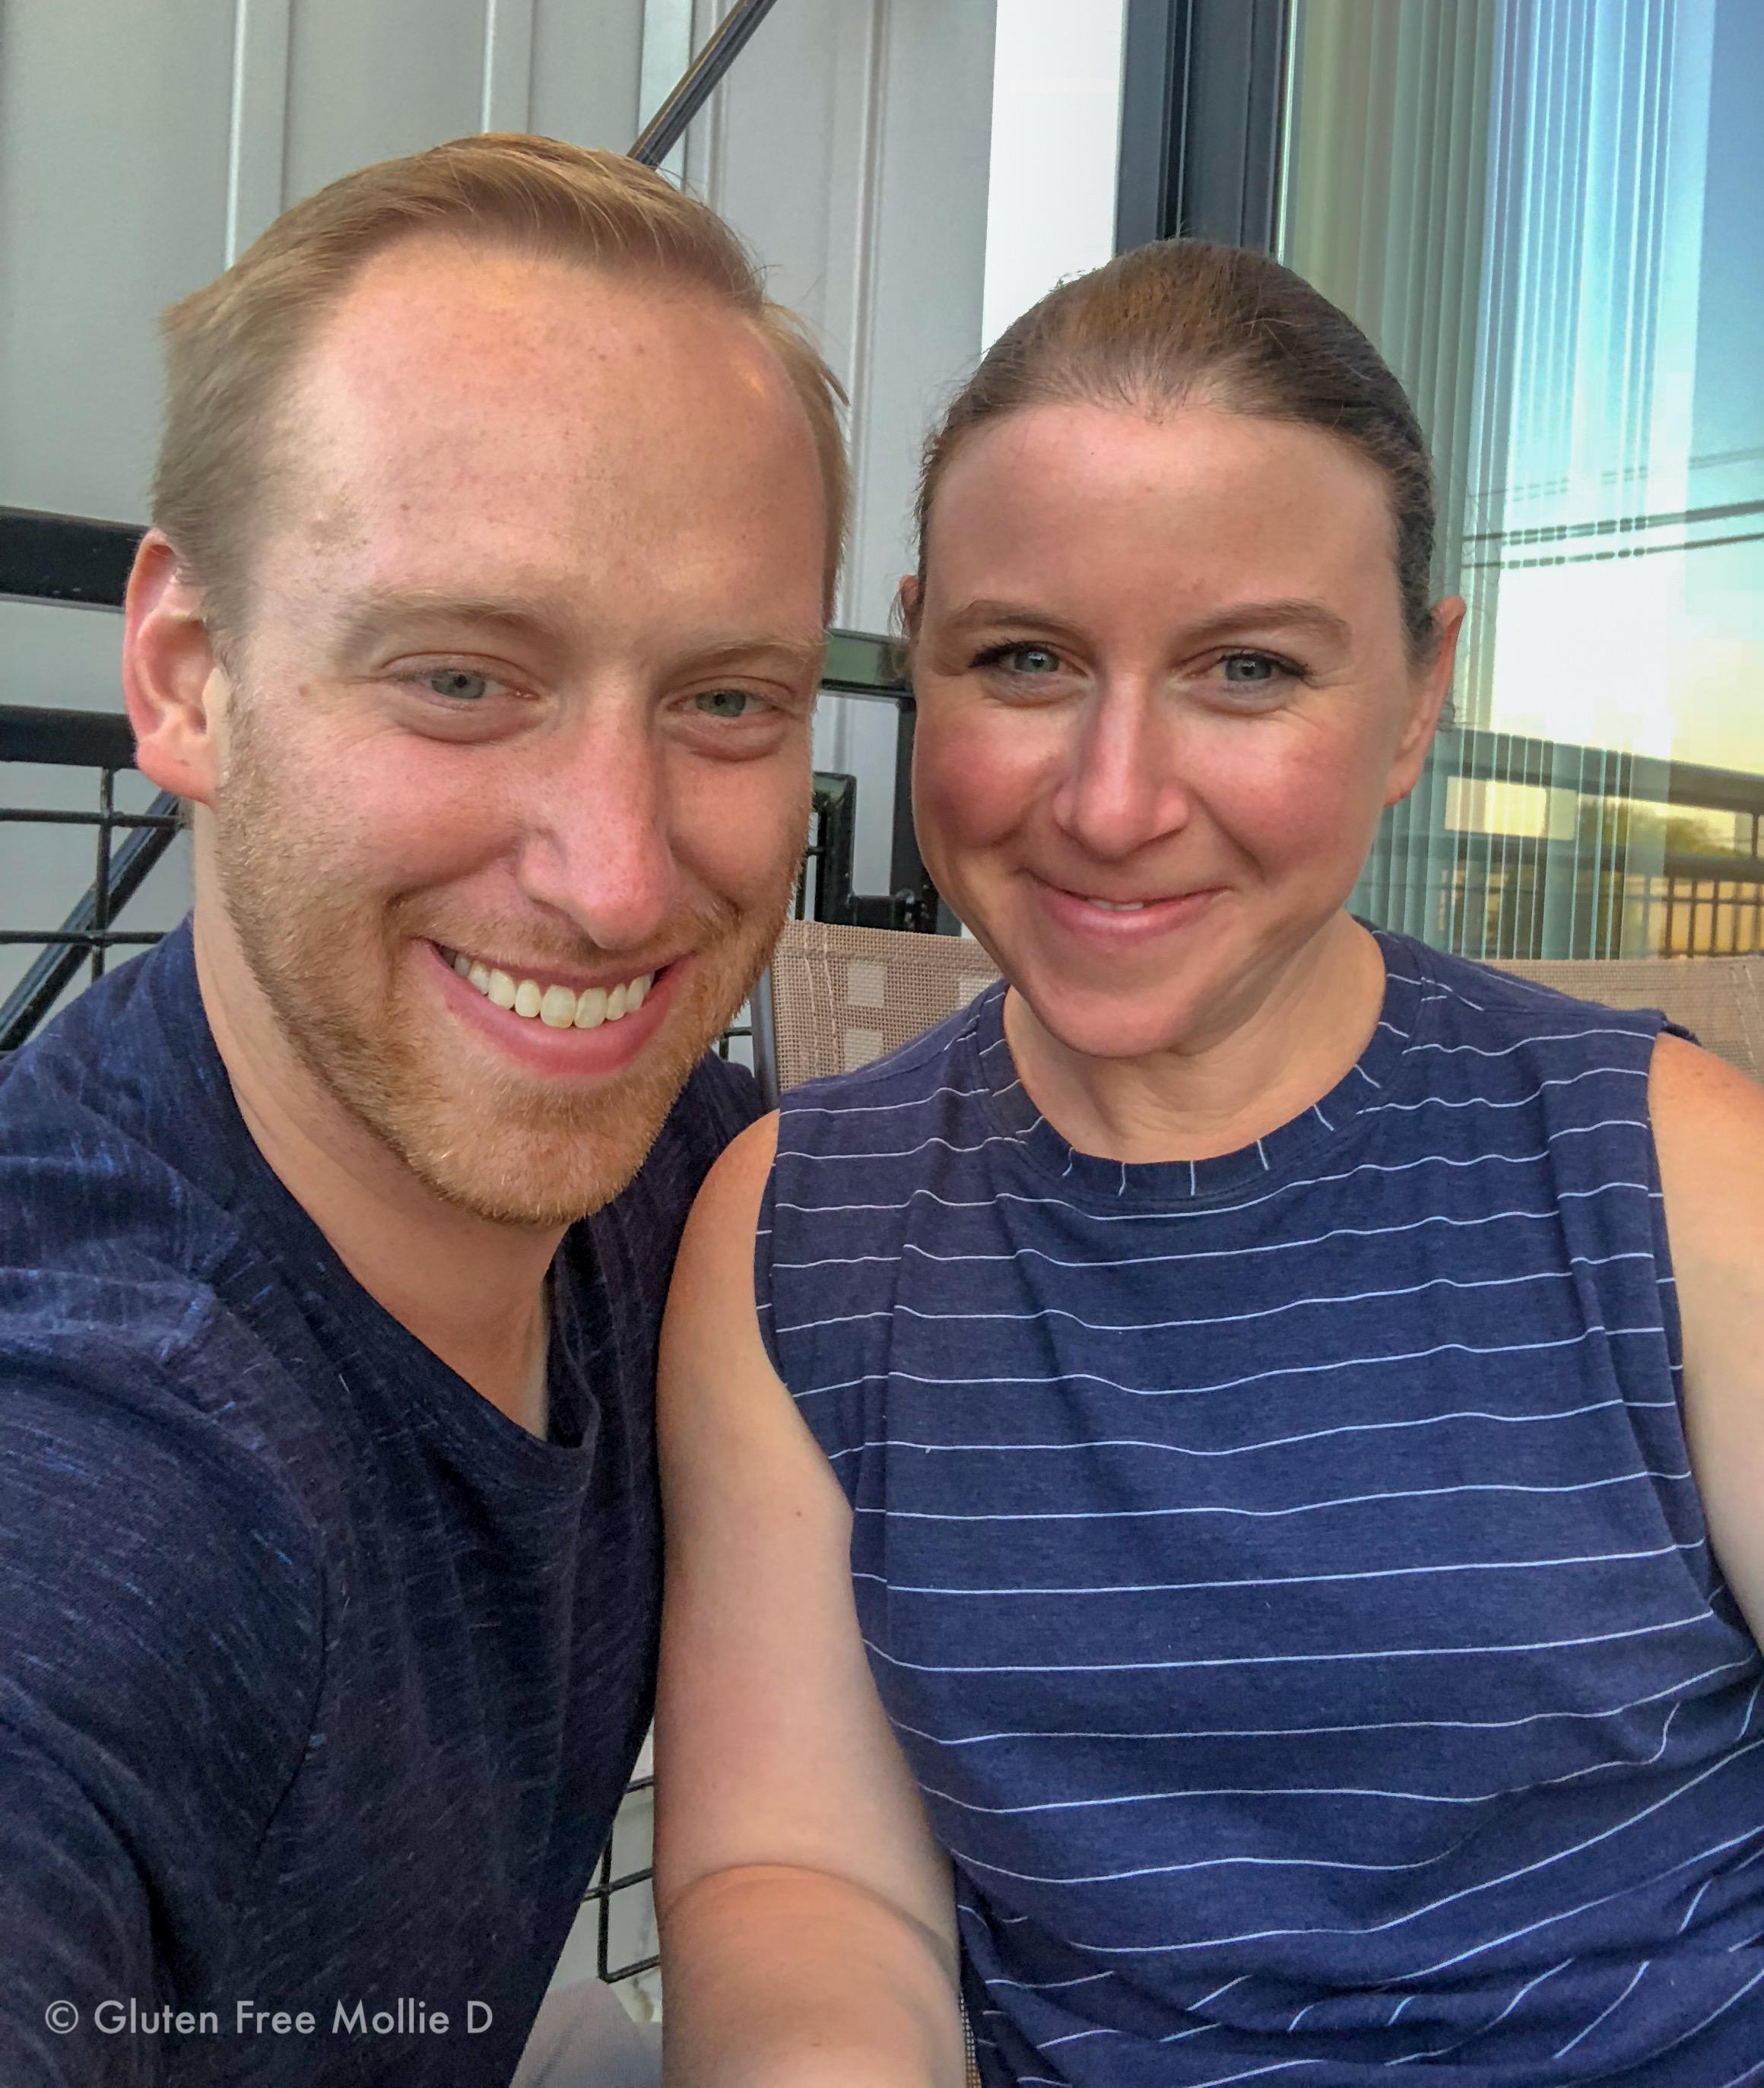 Balcony selfie, post-gym. We only look slightly sleepy! ☺️😬